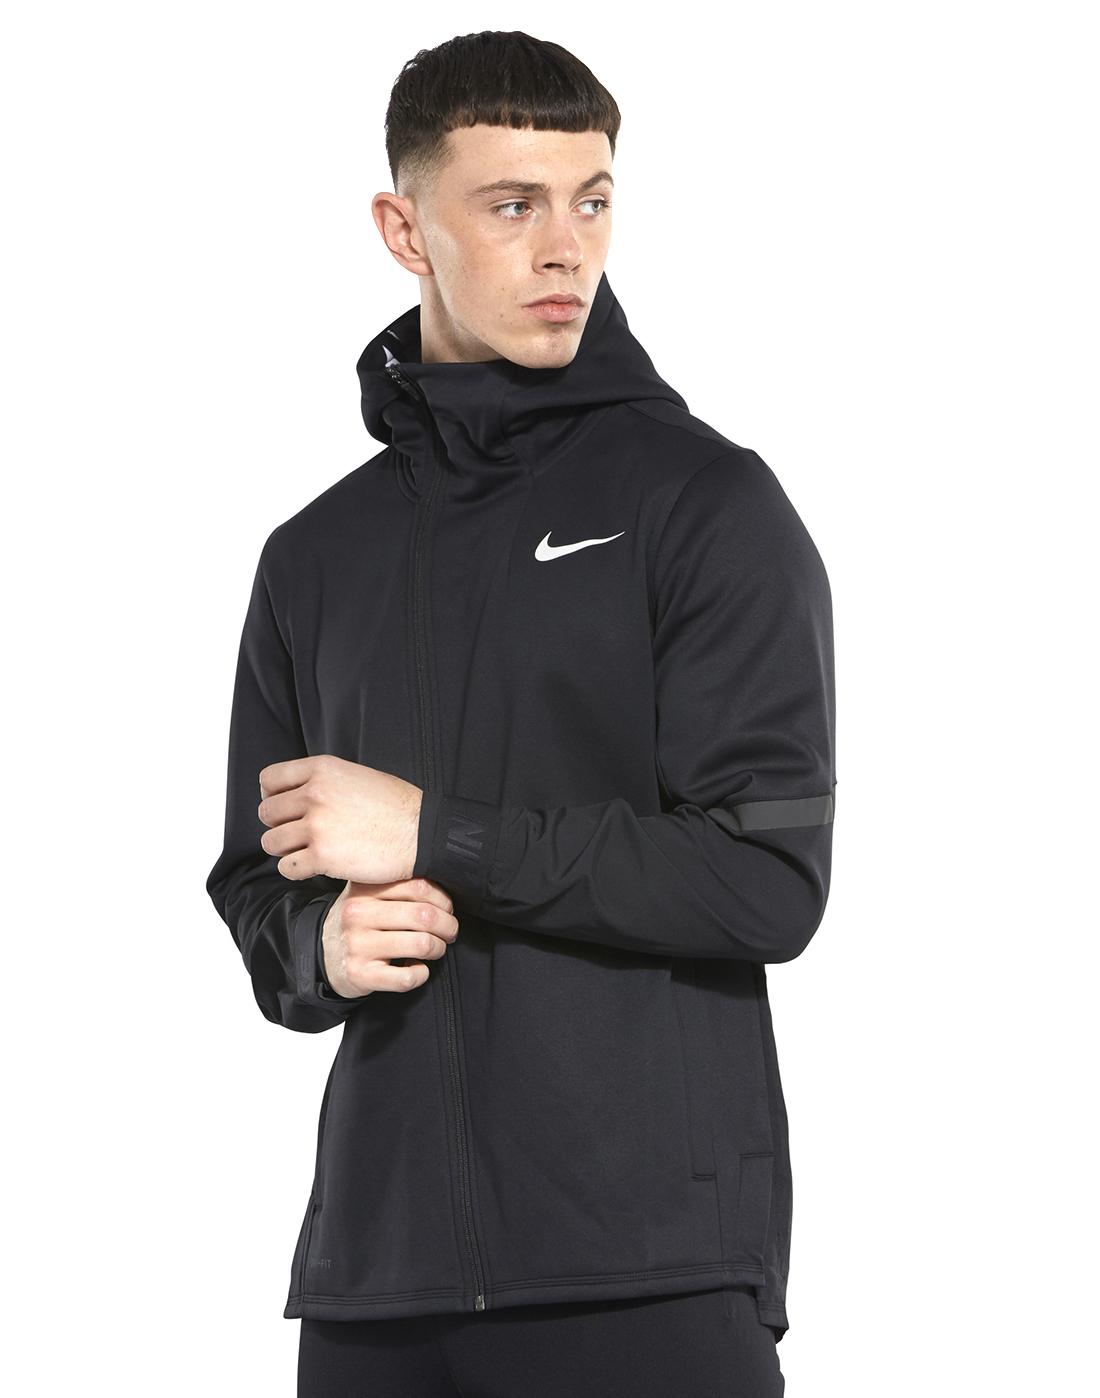 49264ea207d40 Men's Black Nike Therma Hoodie | Life Style Sports